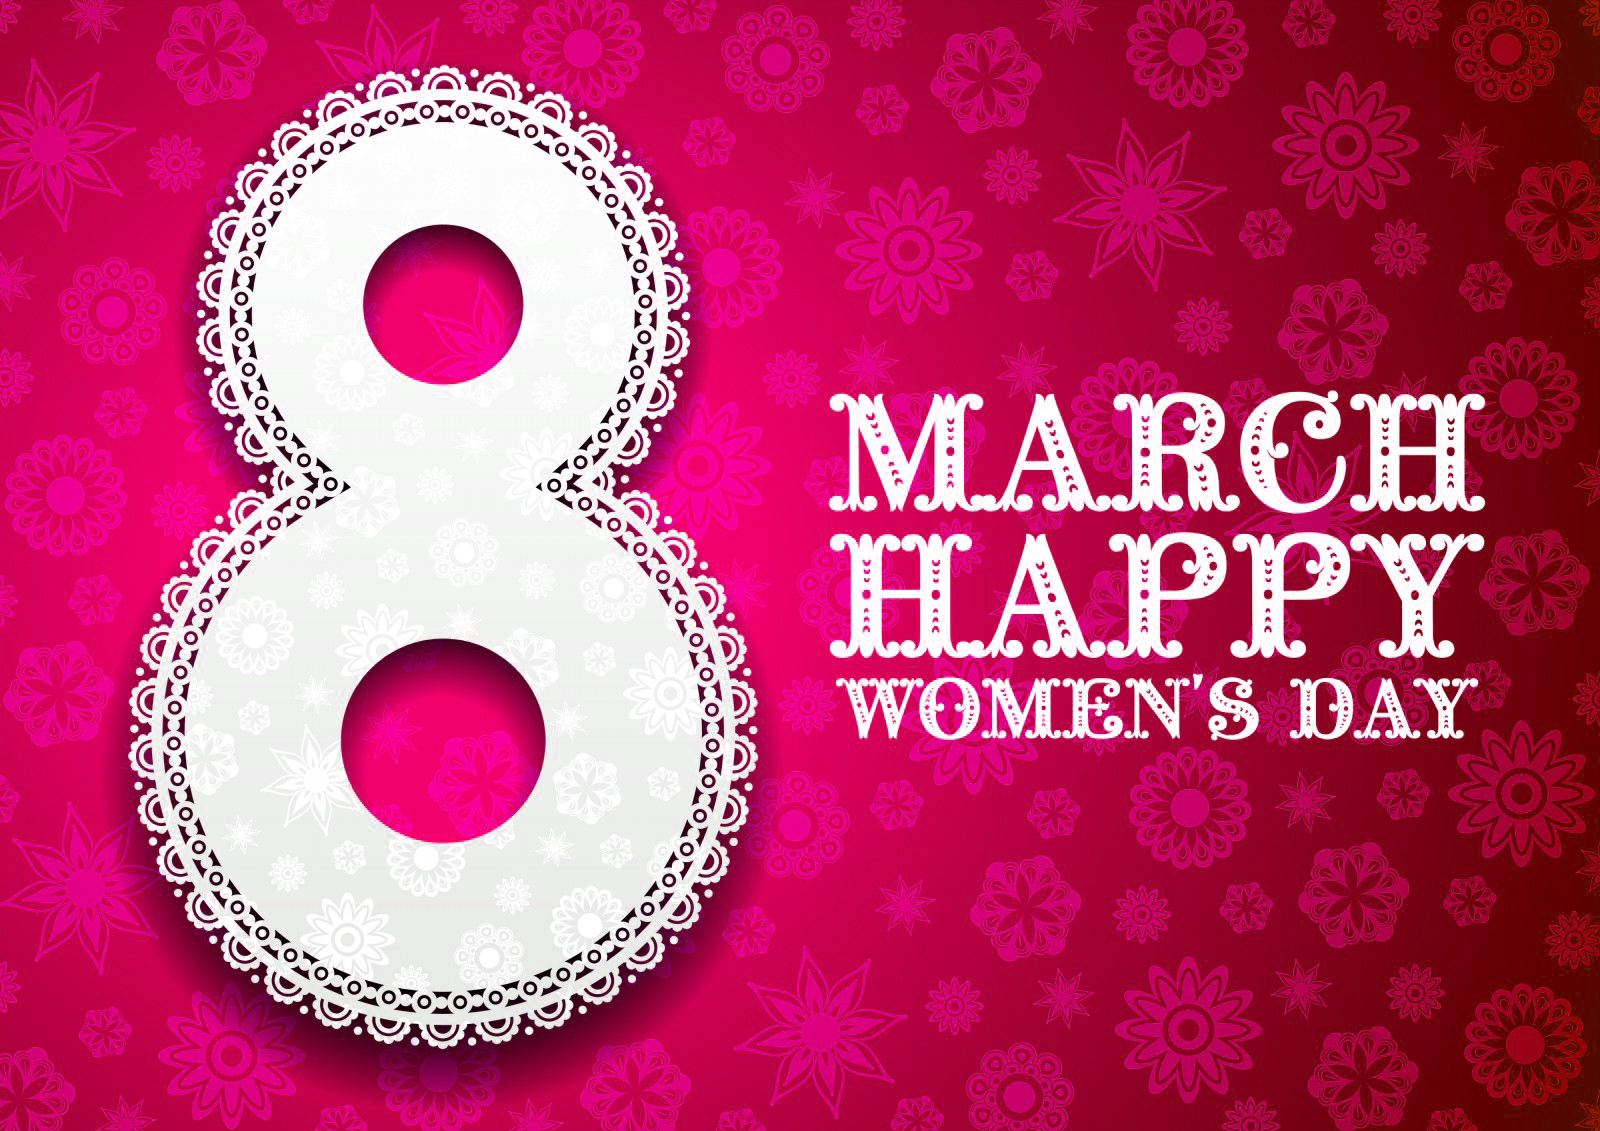 download Womens Day Wallpaper 17 1600 X 1131 stmednet 1600x1131